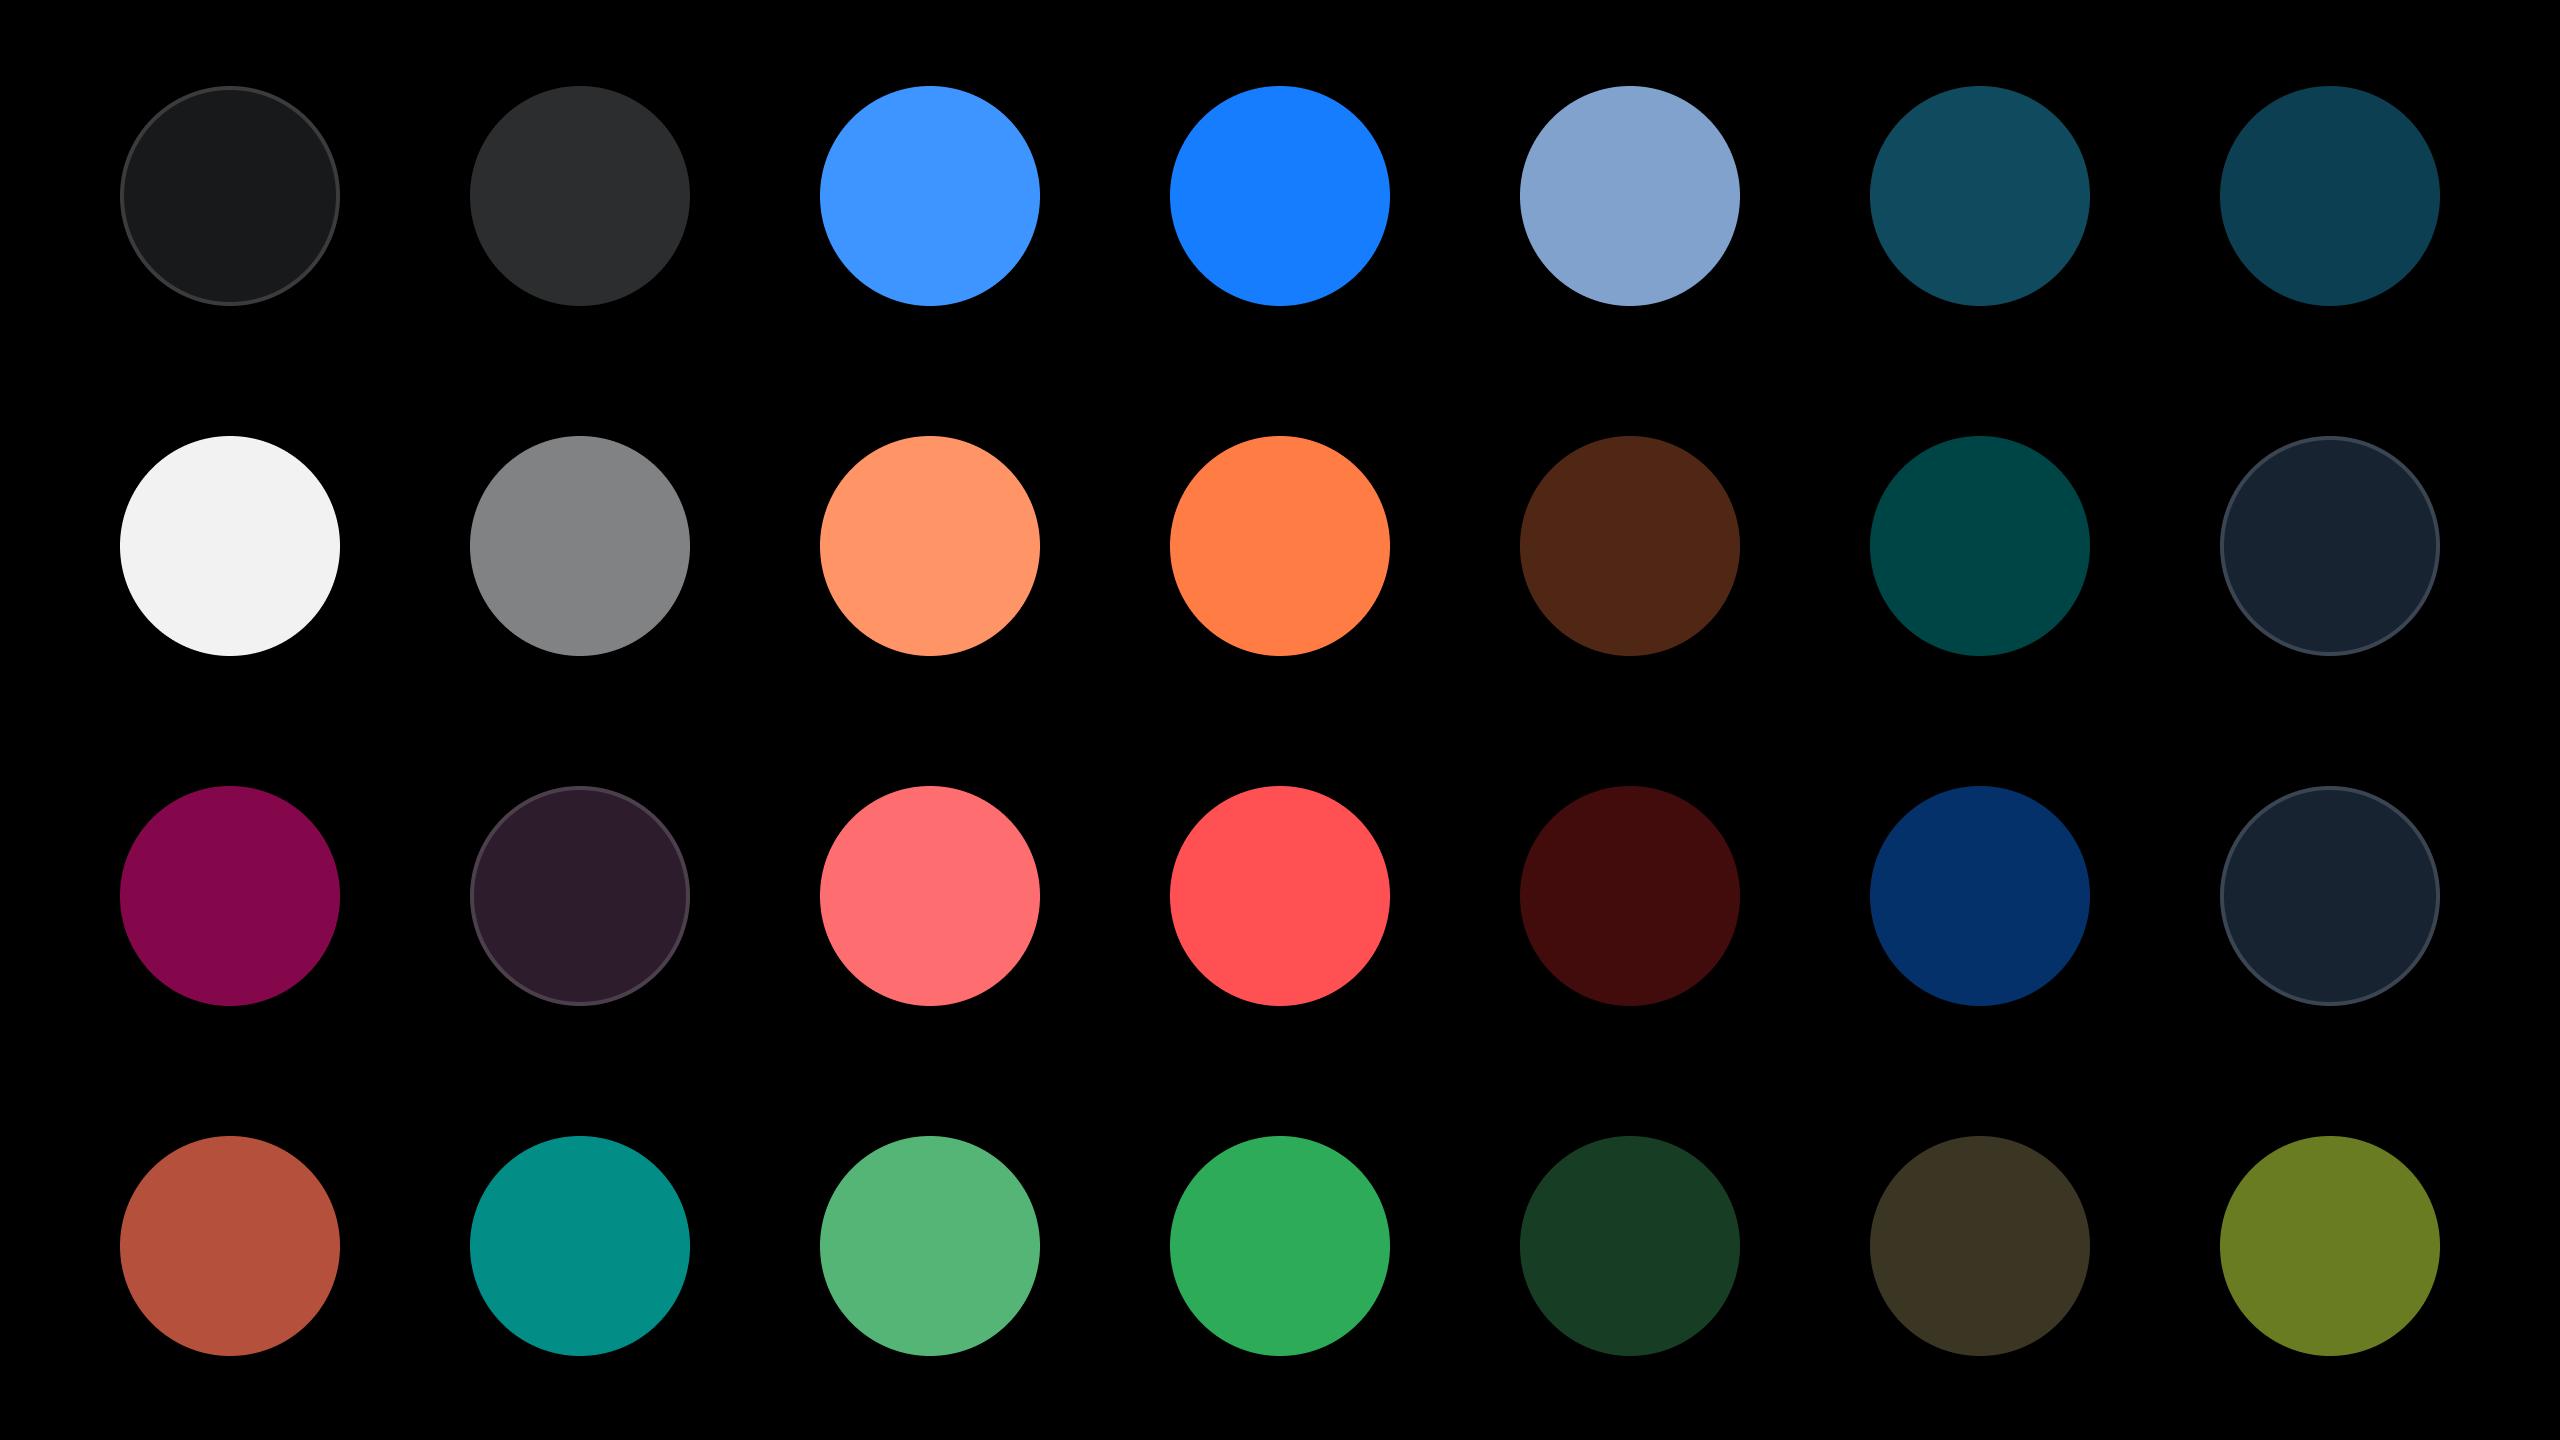 Space Koyu Tema Paleti